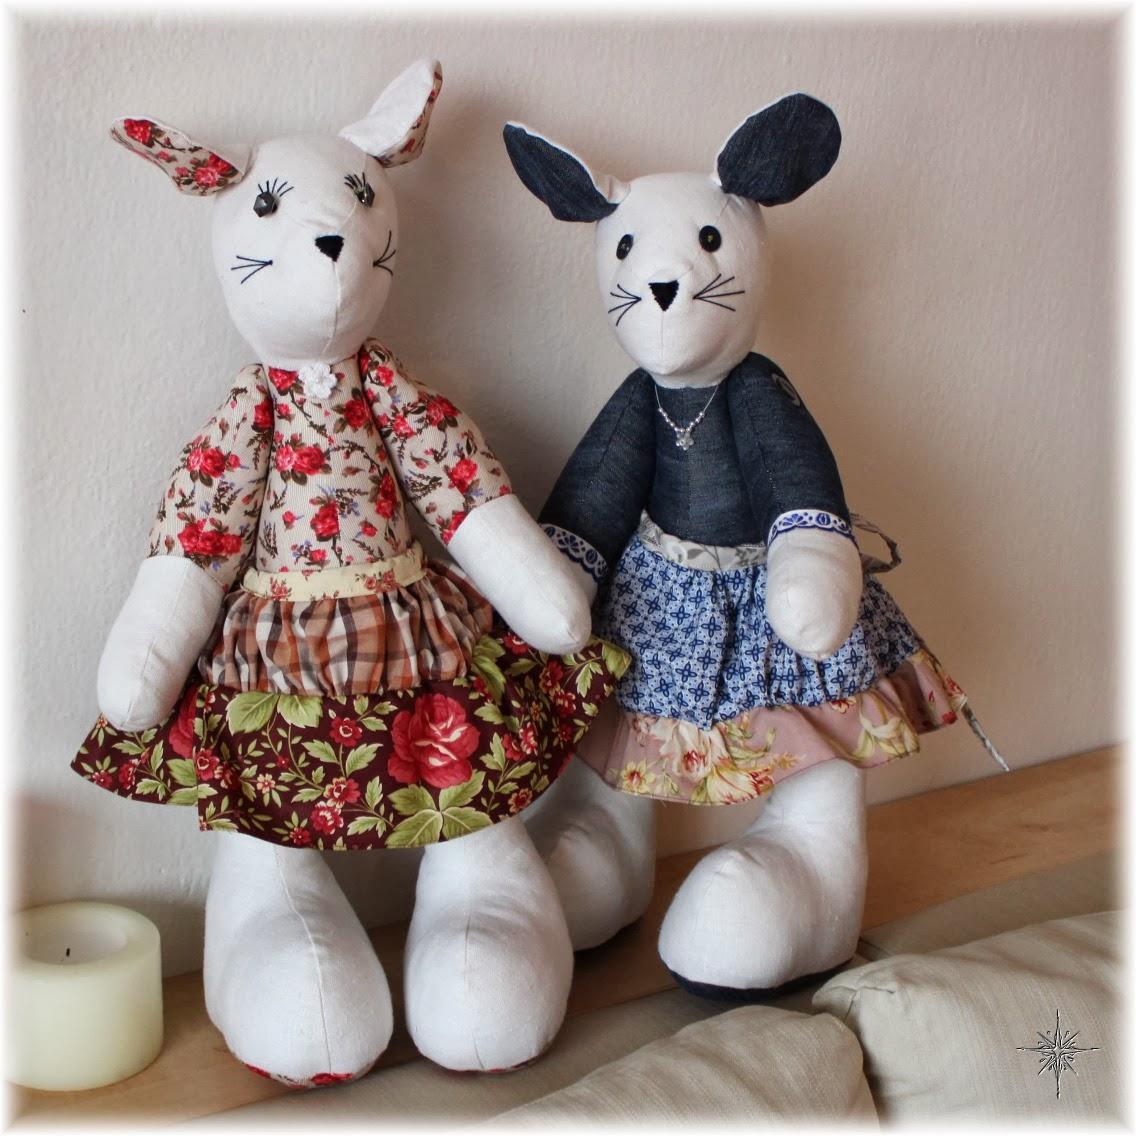 šitá hračka - myška